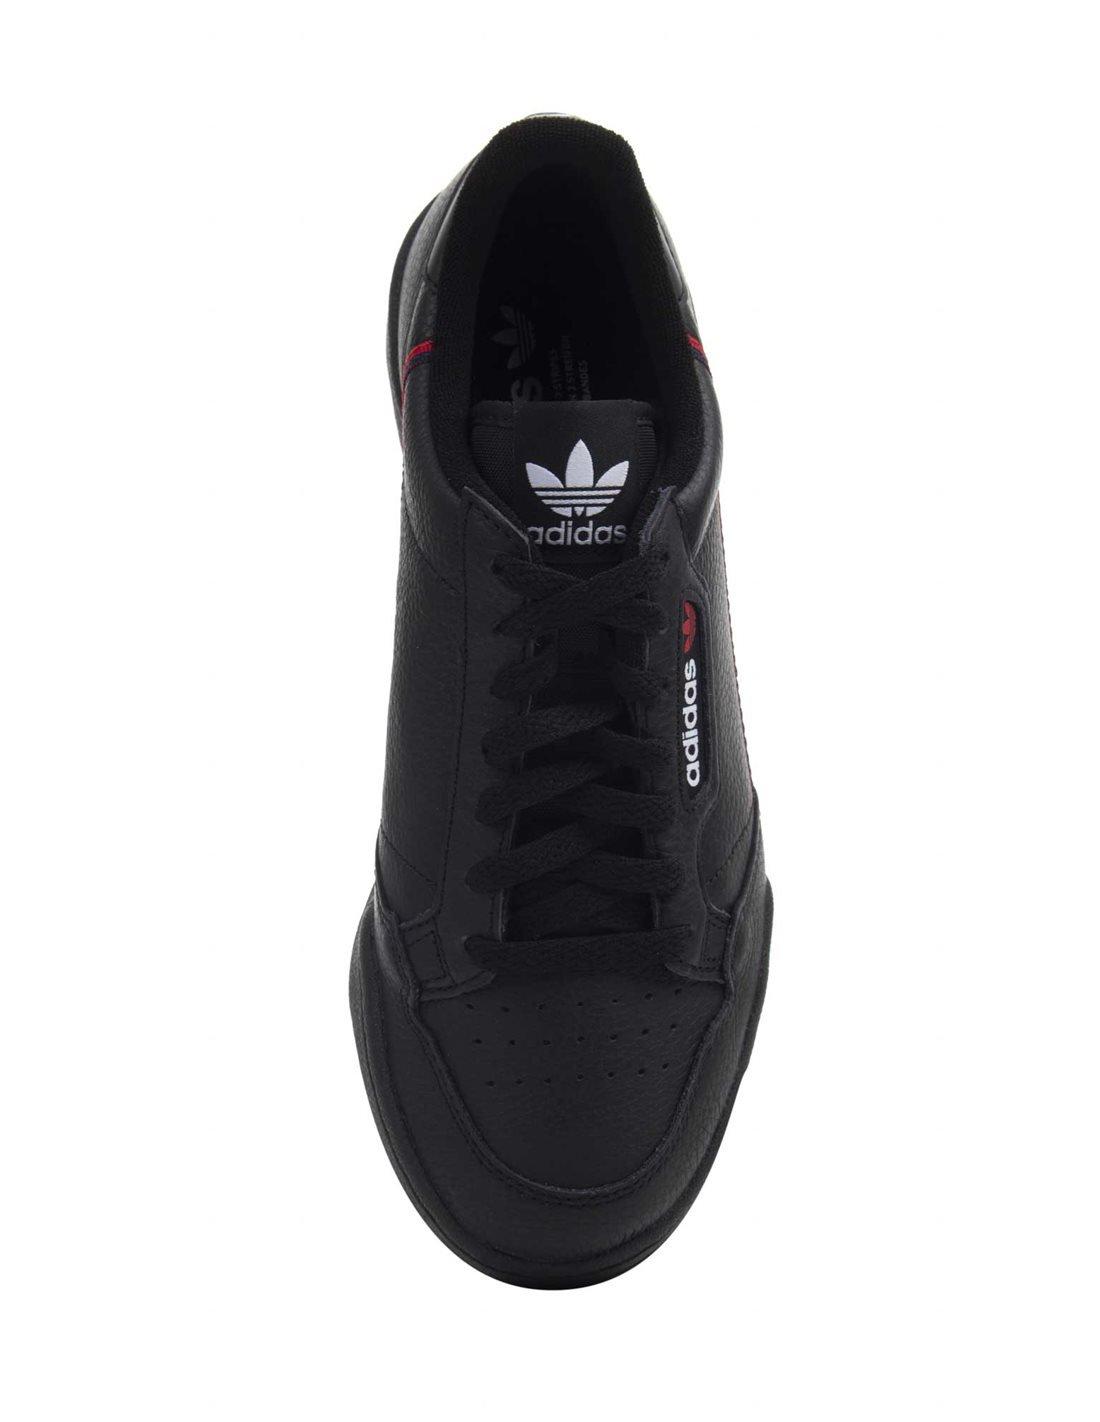 b424bfc0db9 Reebok Classic - Classic Leather Men s Sneakers White